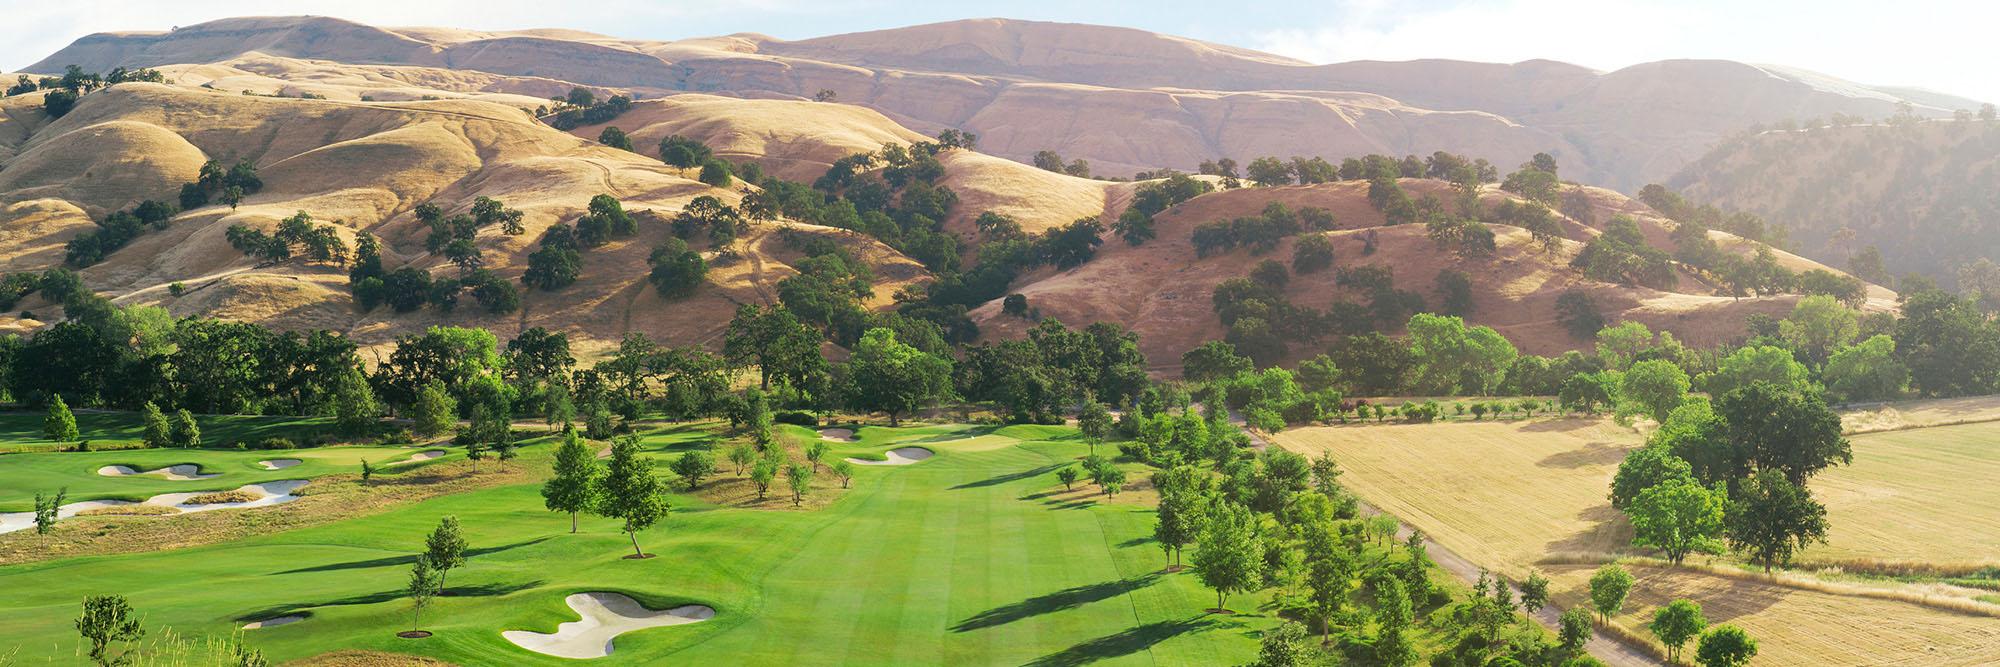 Golf Course Image - Yocha Dehe No. 1